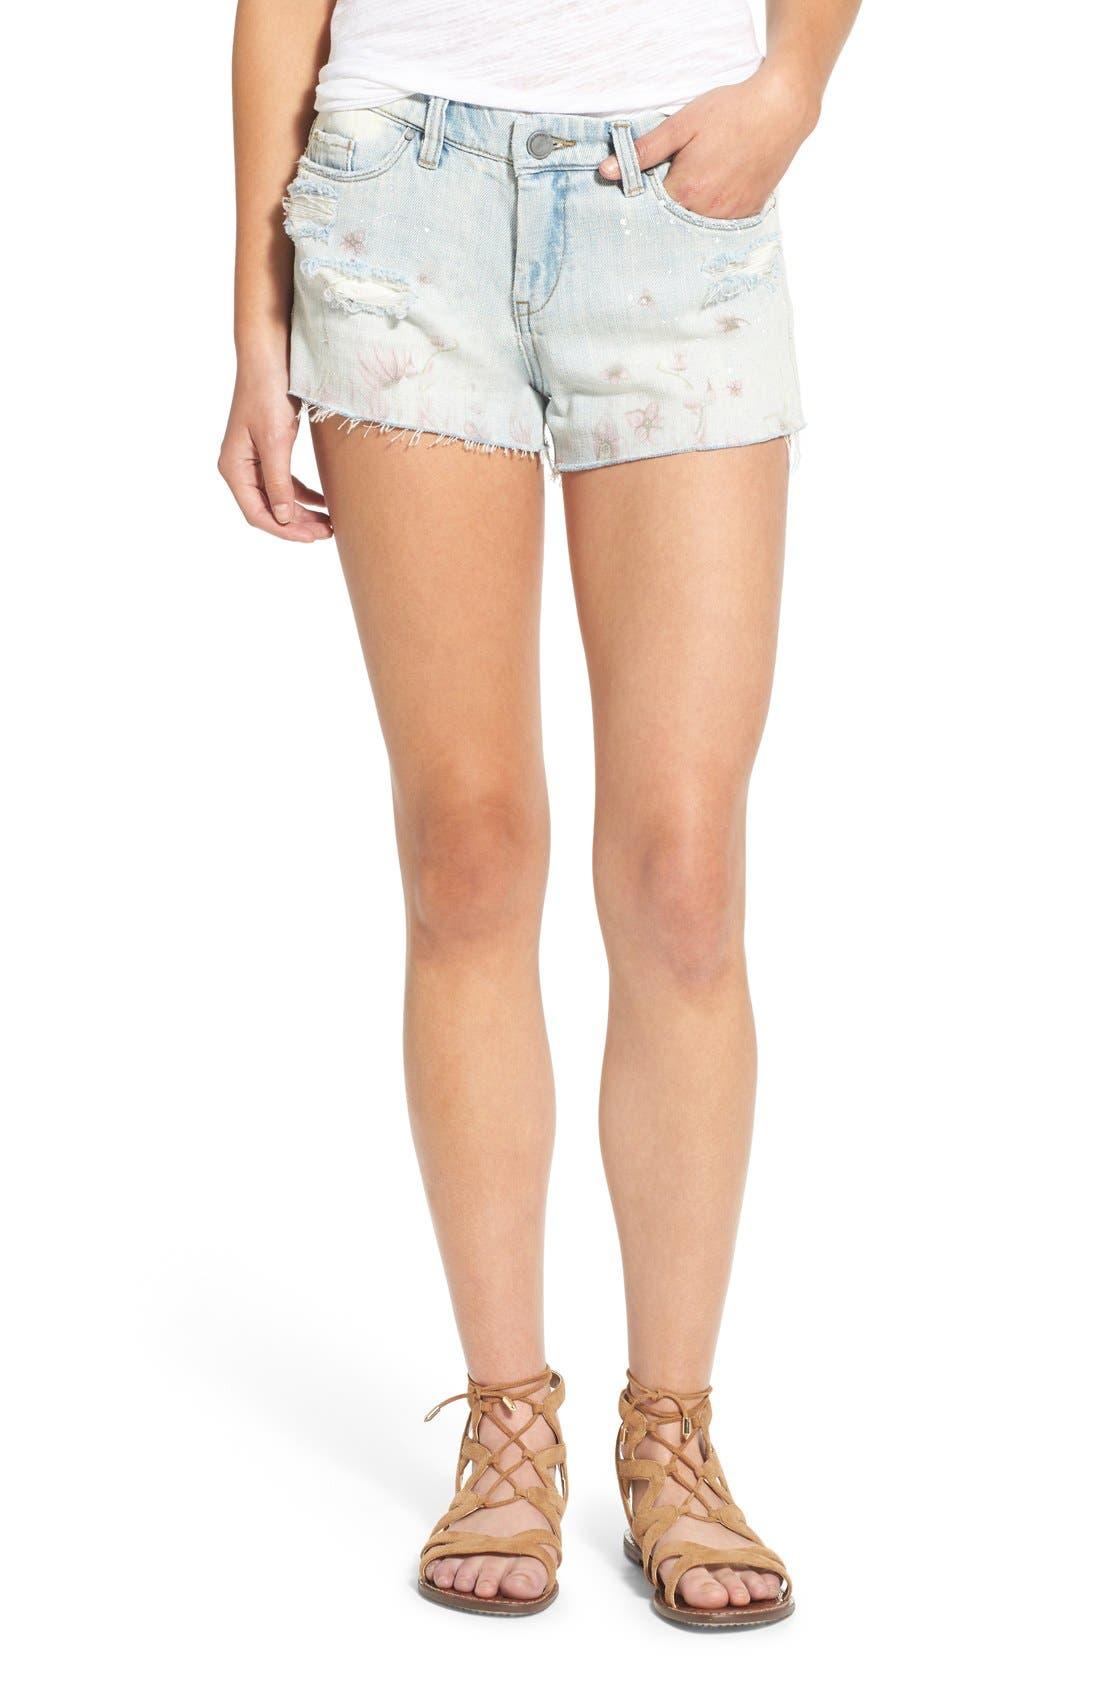 Alternate Image 1 Selected - BLANKNYC 'Kitty Flower' Distressed Cutoff Denim Shorts